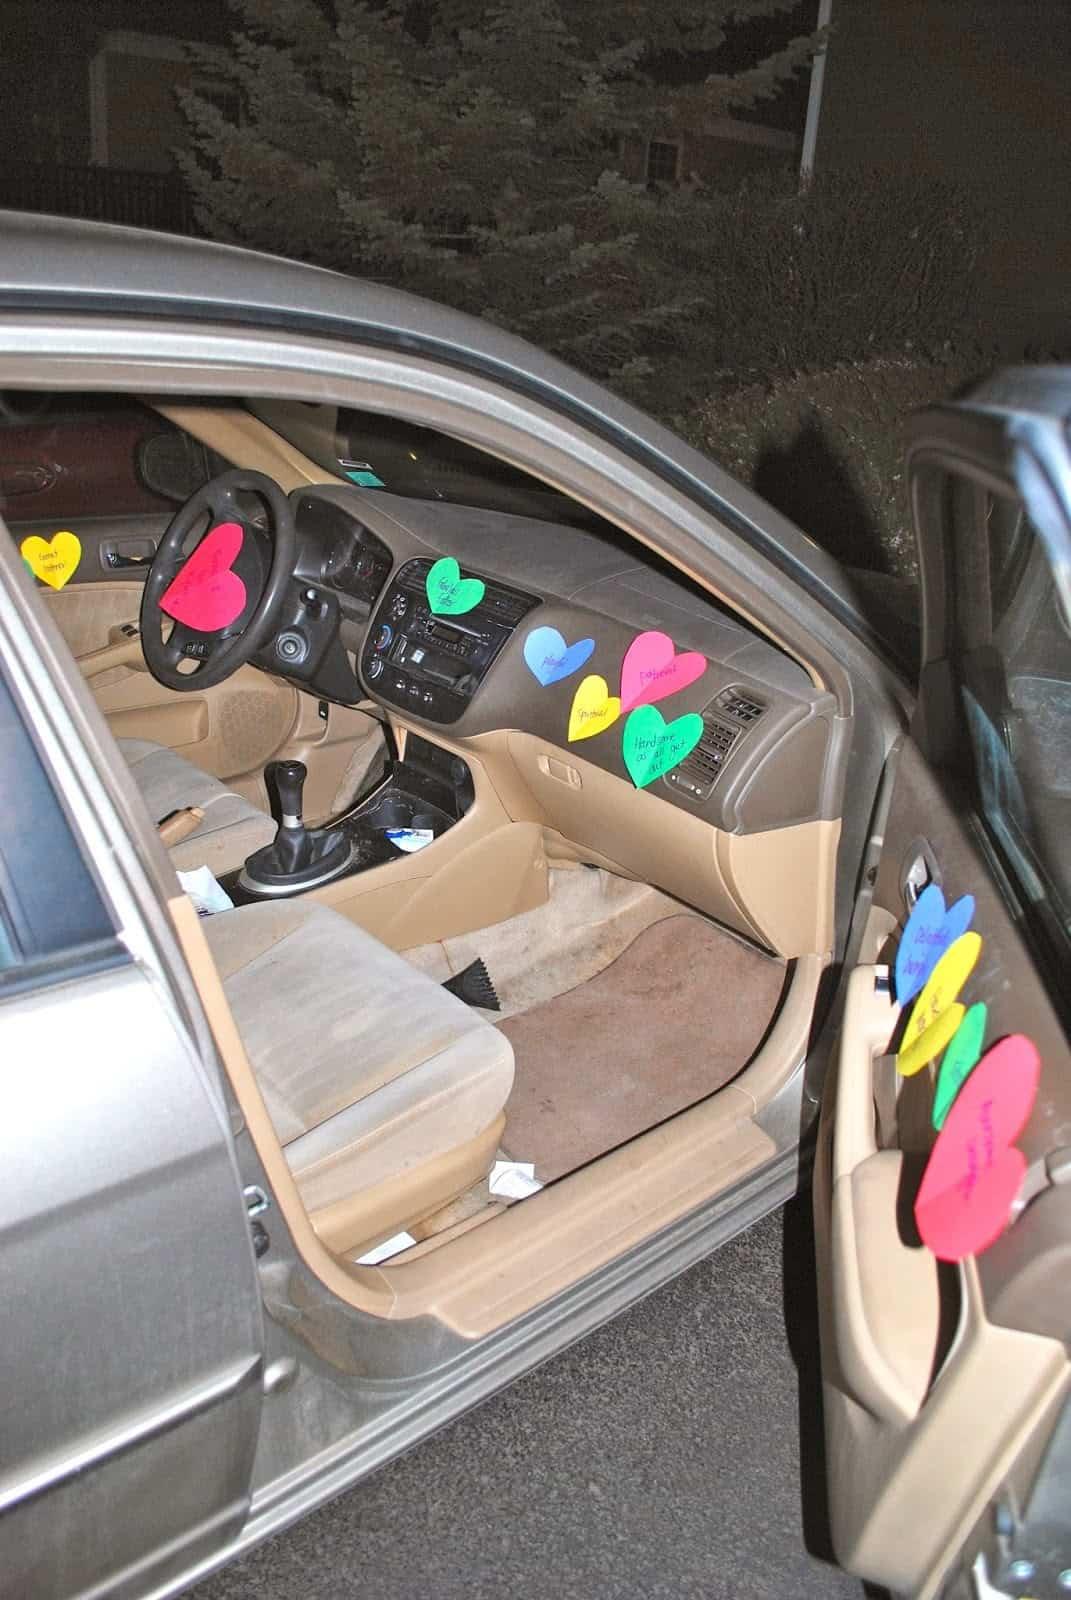 Car Full of Heart Notes/DIY Boyfriend gifts